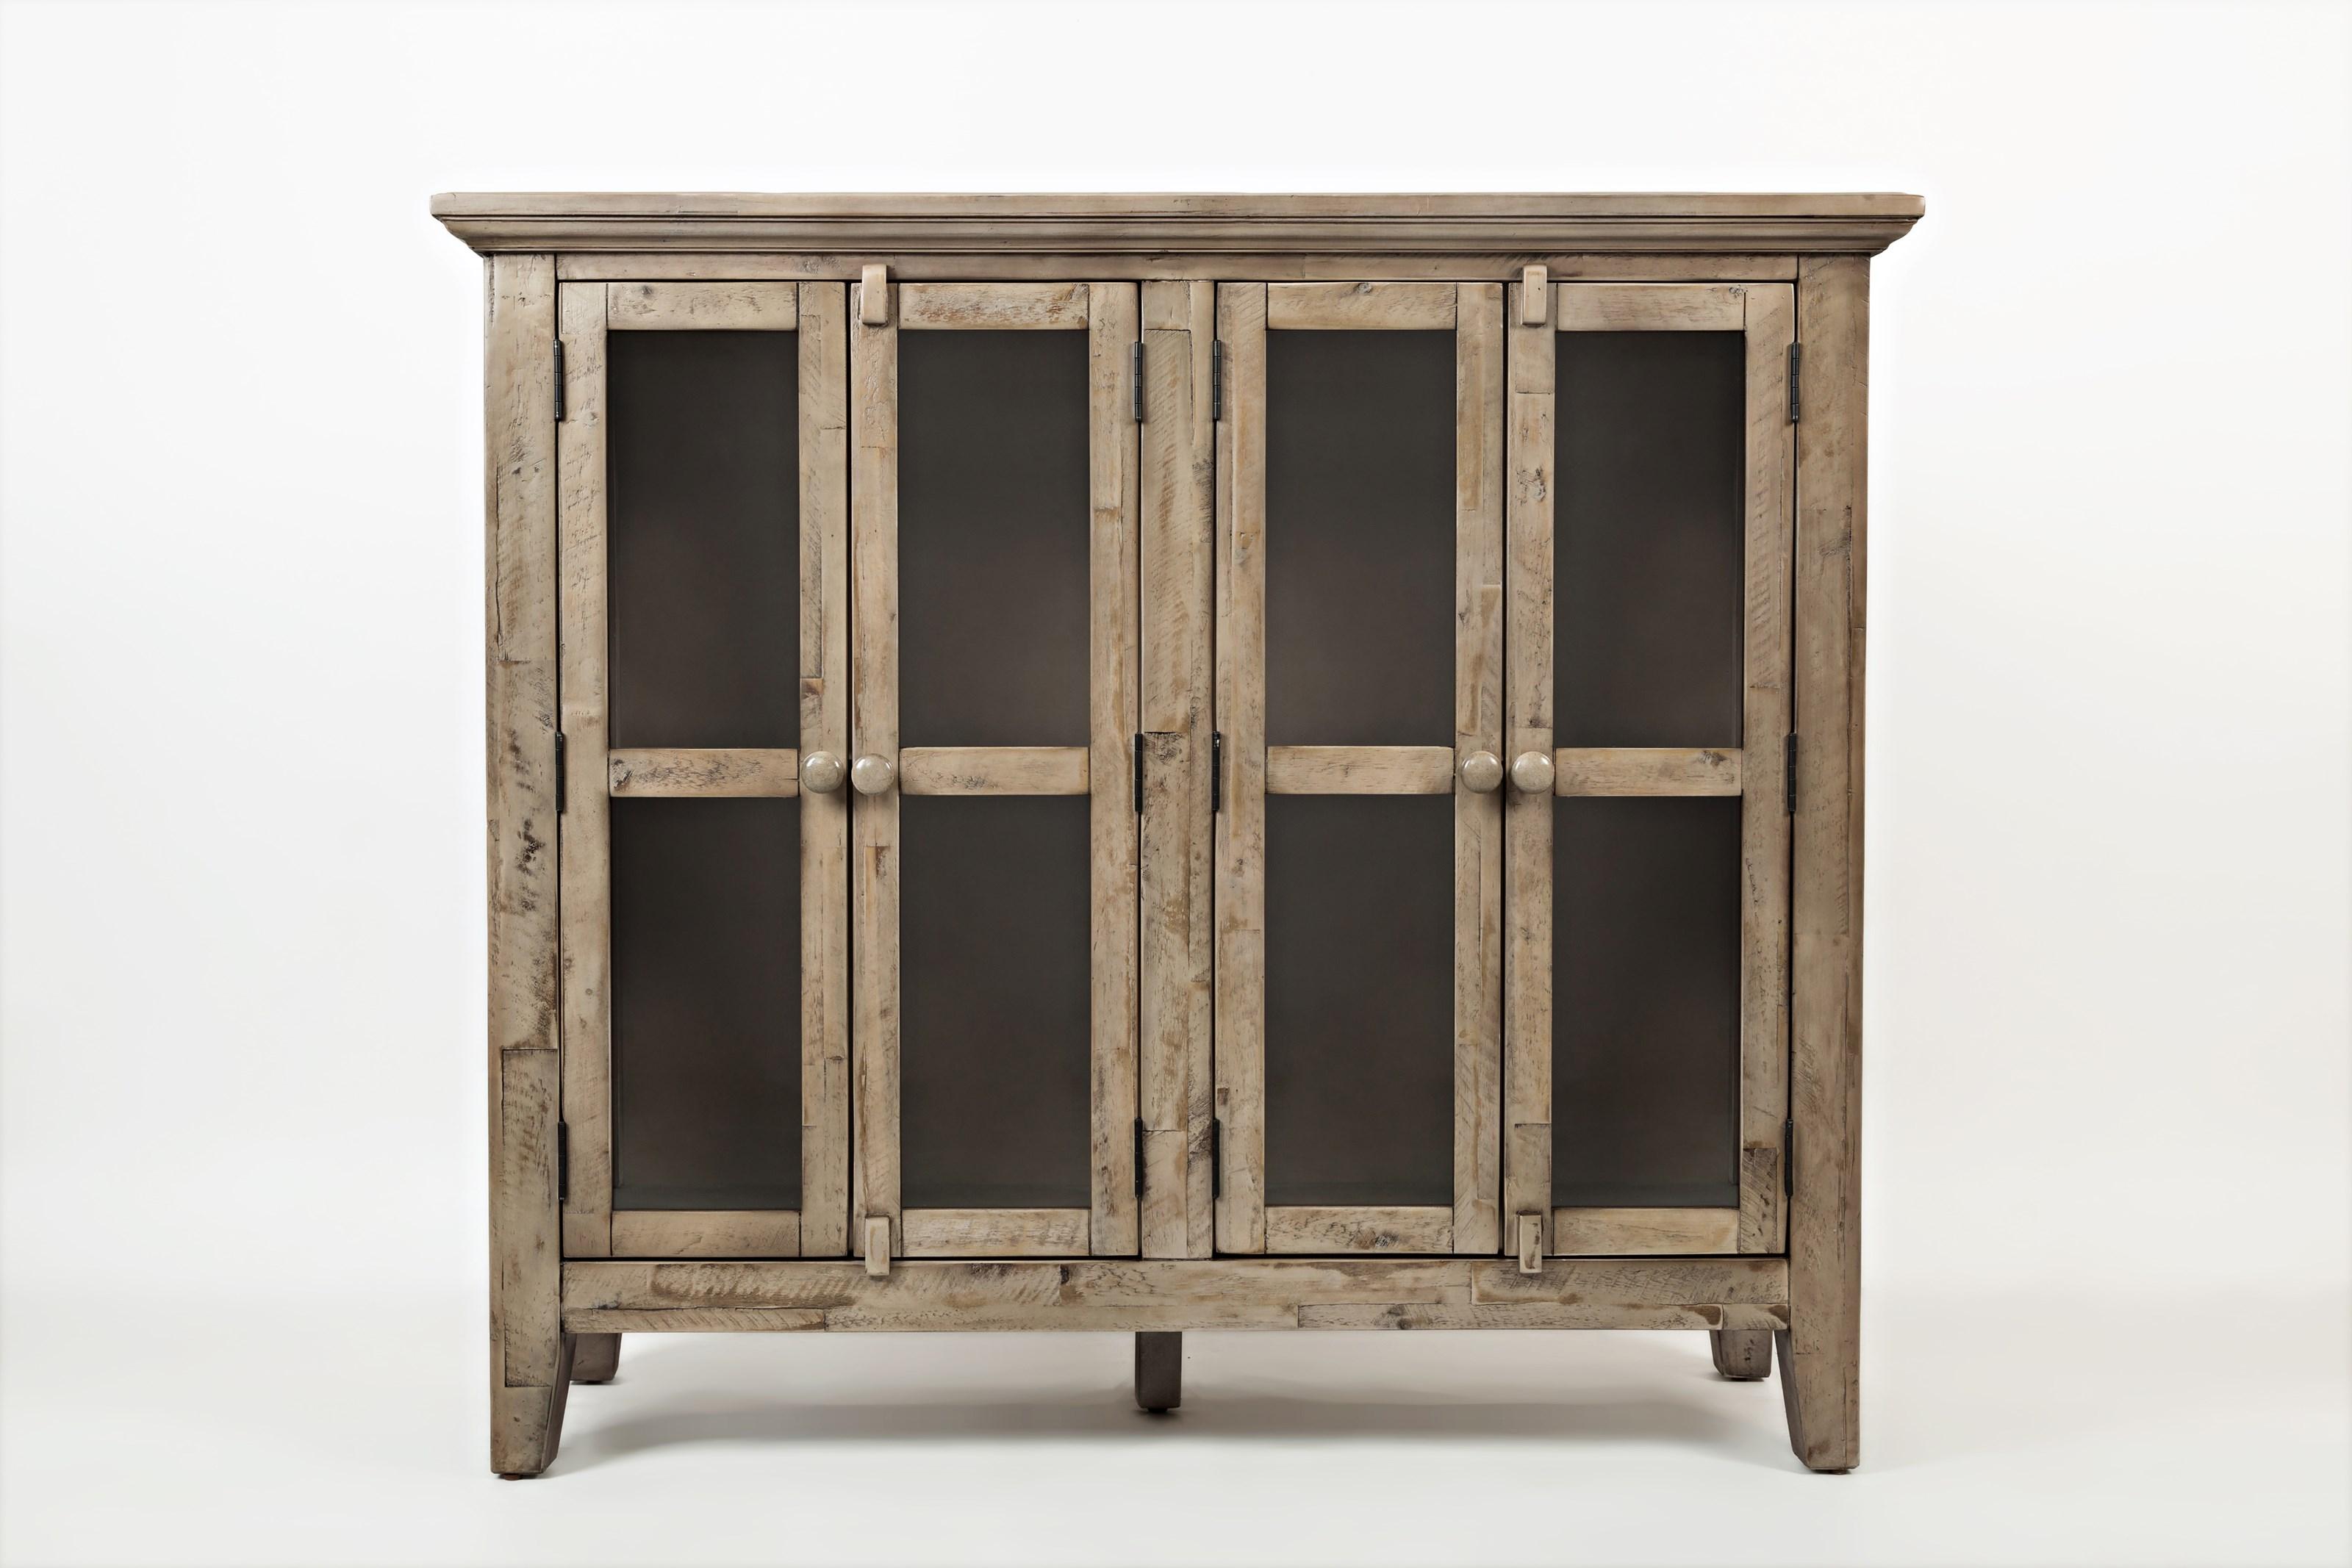 Rustic Shores 4 Door High Cabinet by Jofran at Johnny Janosik